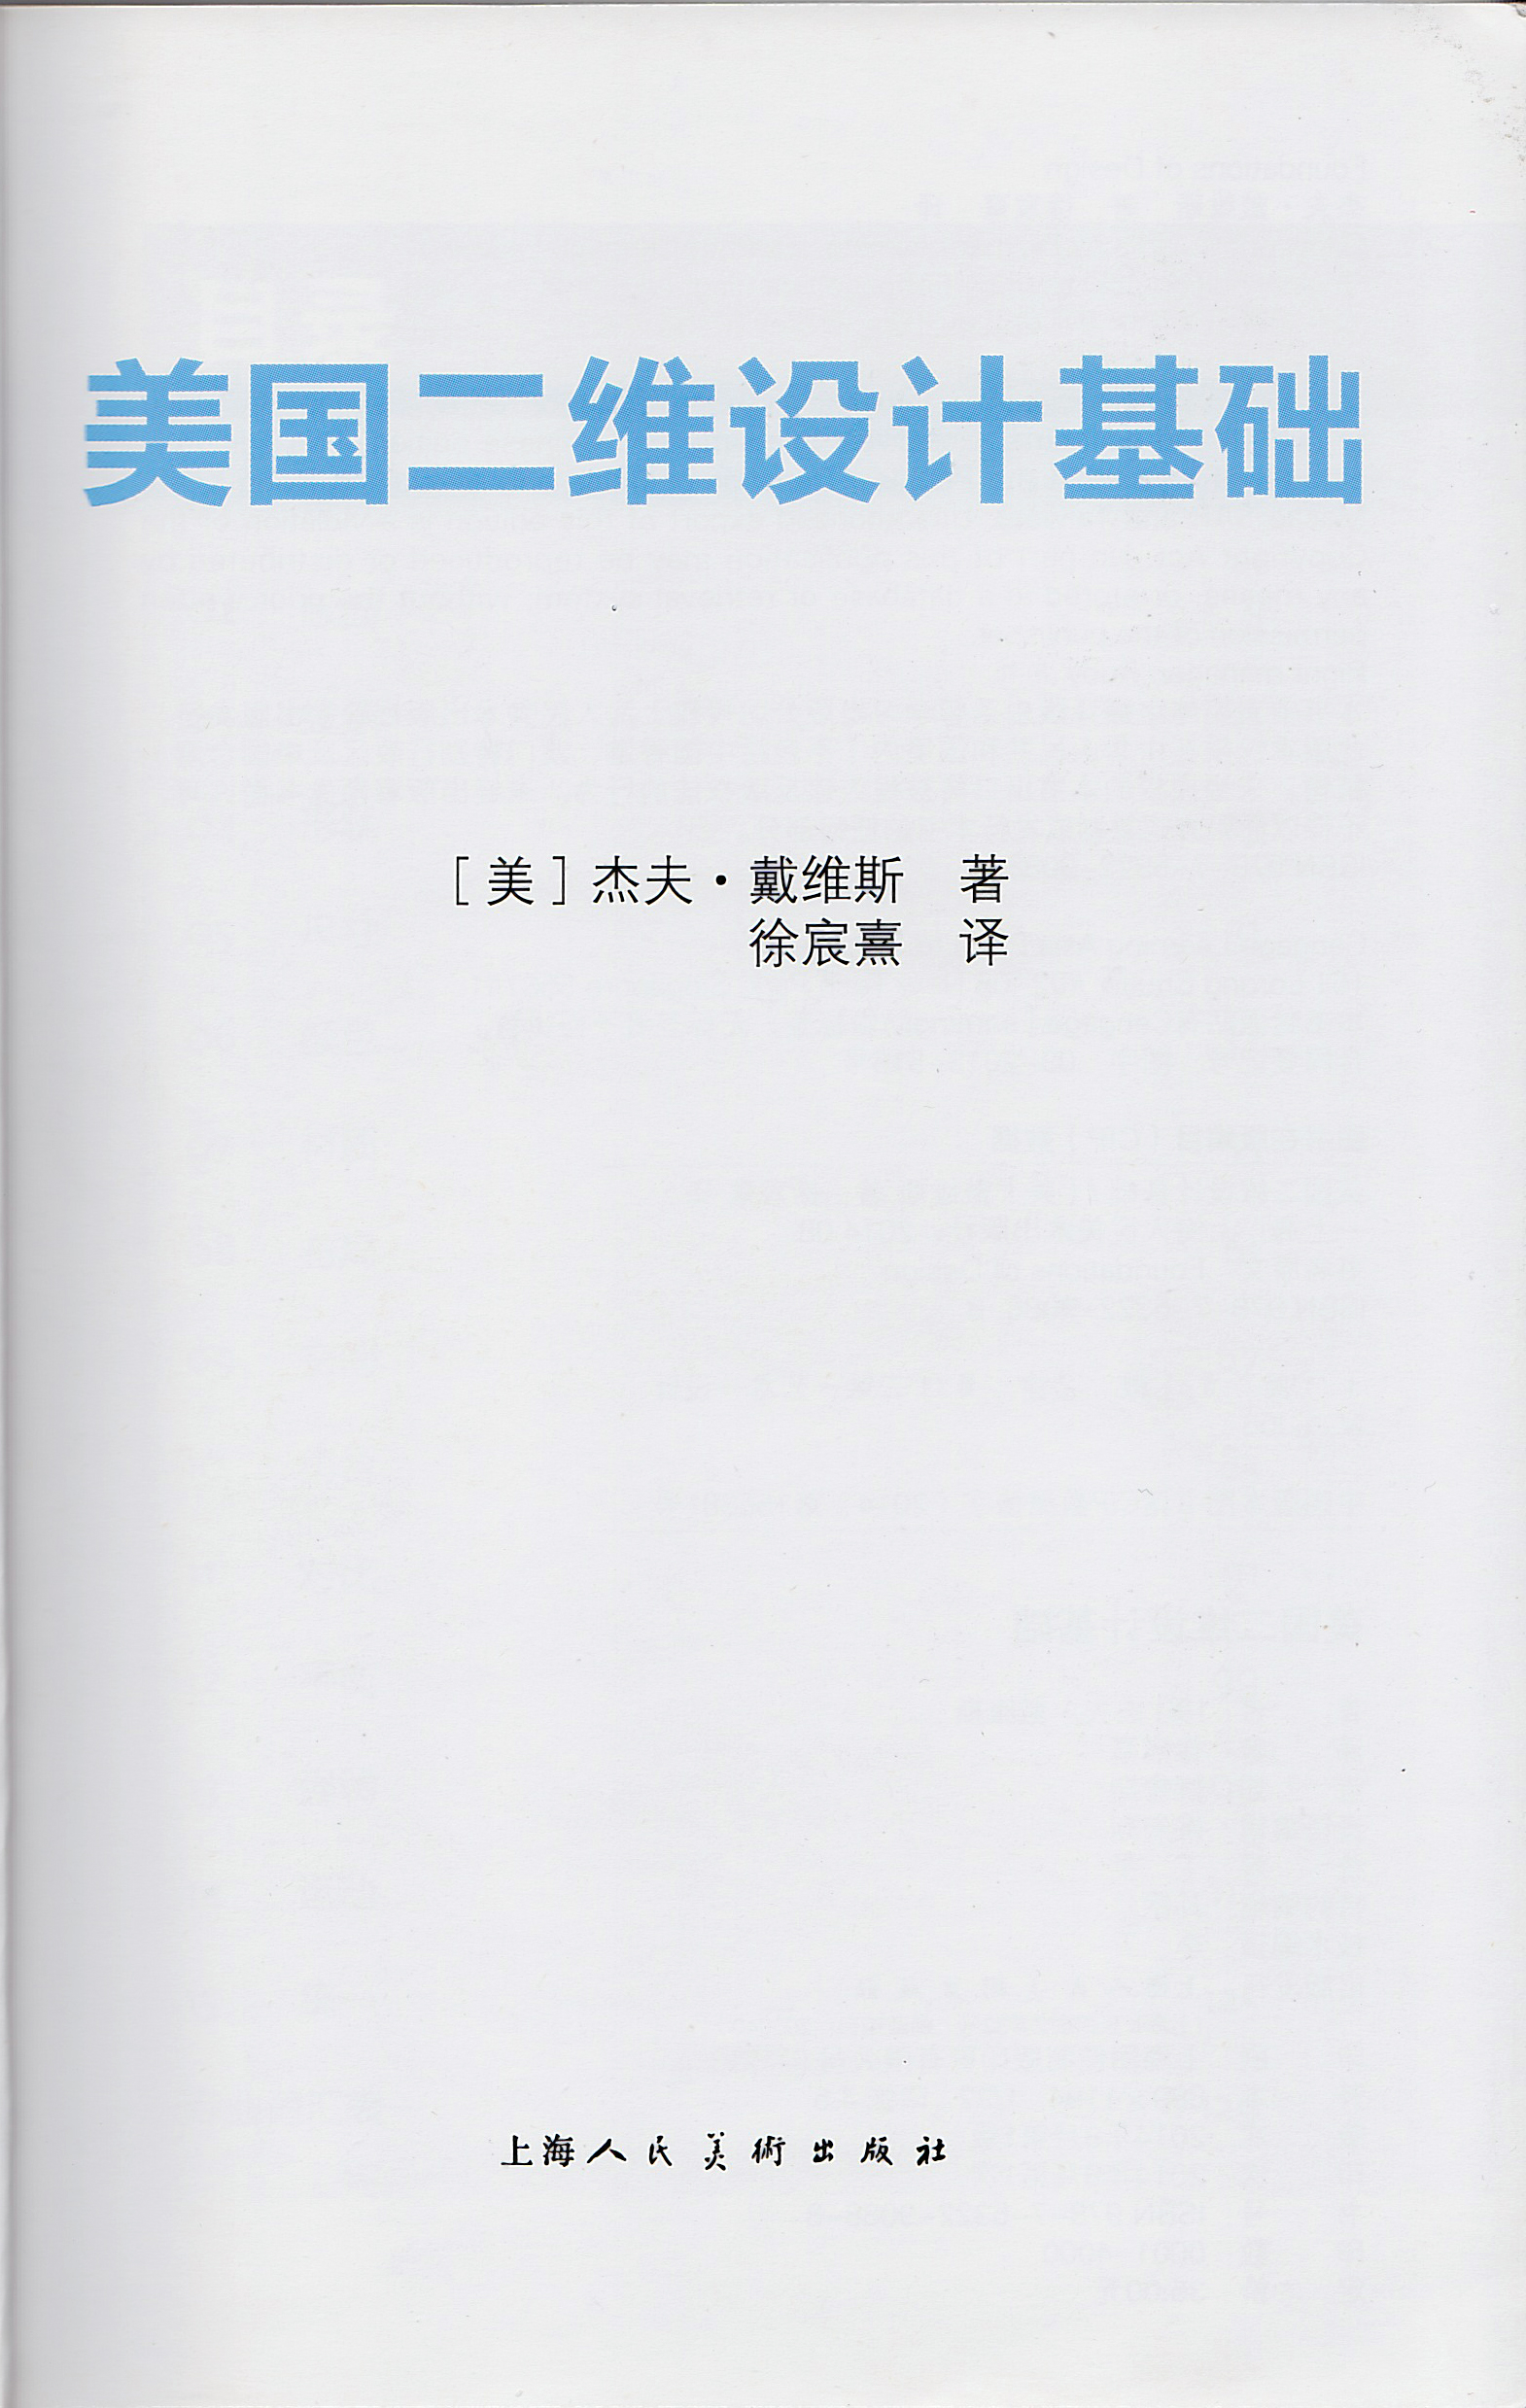 IMG0003.jpg